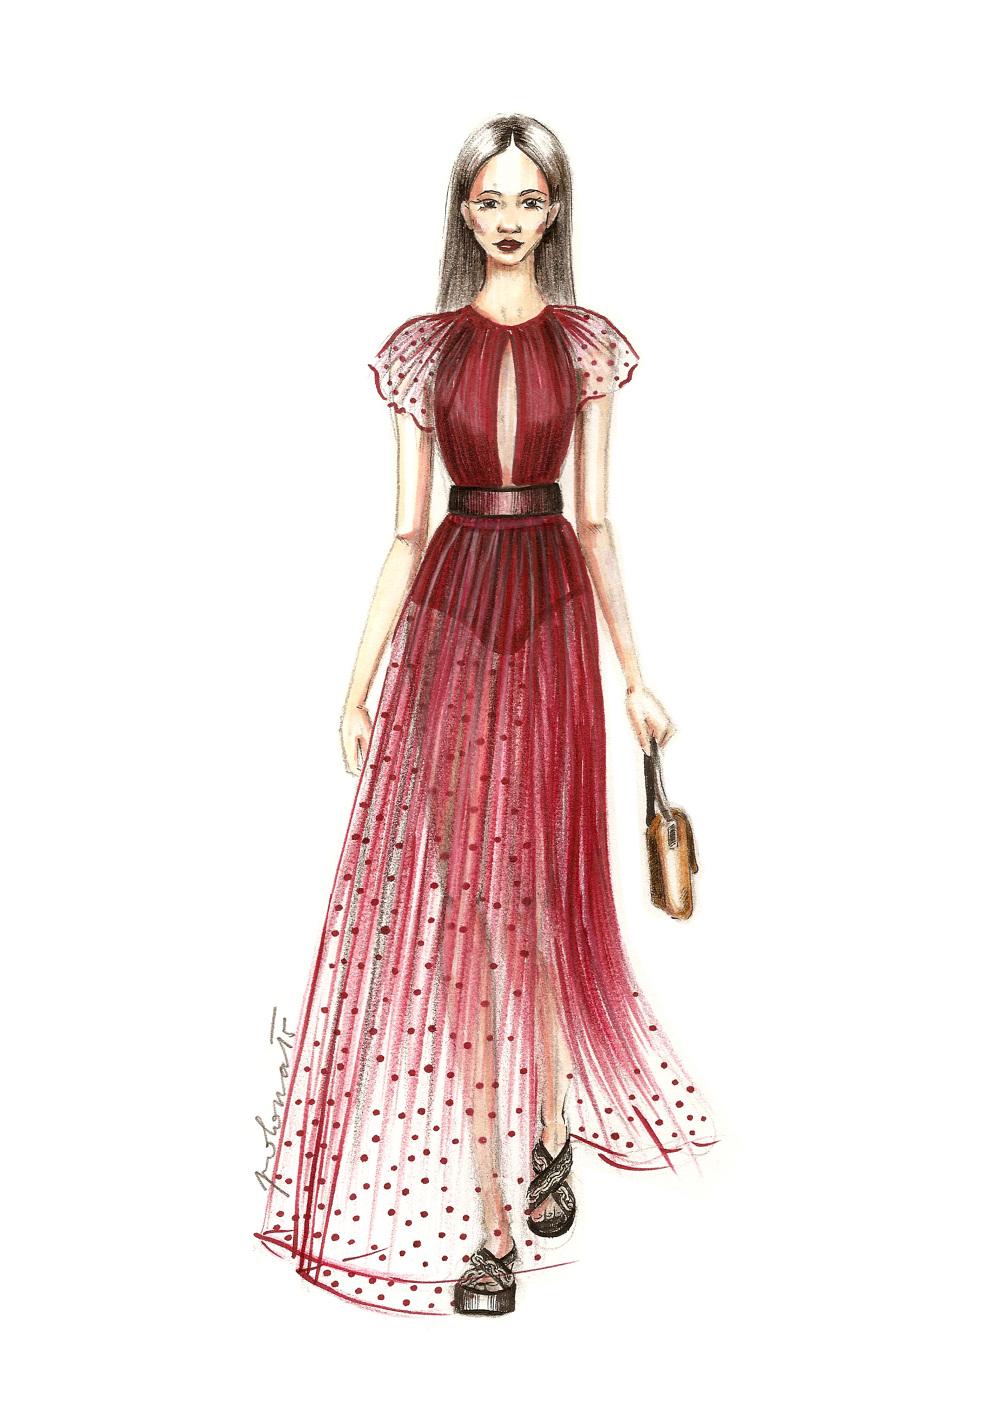 fashion illustration polona Žalig